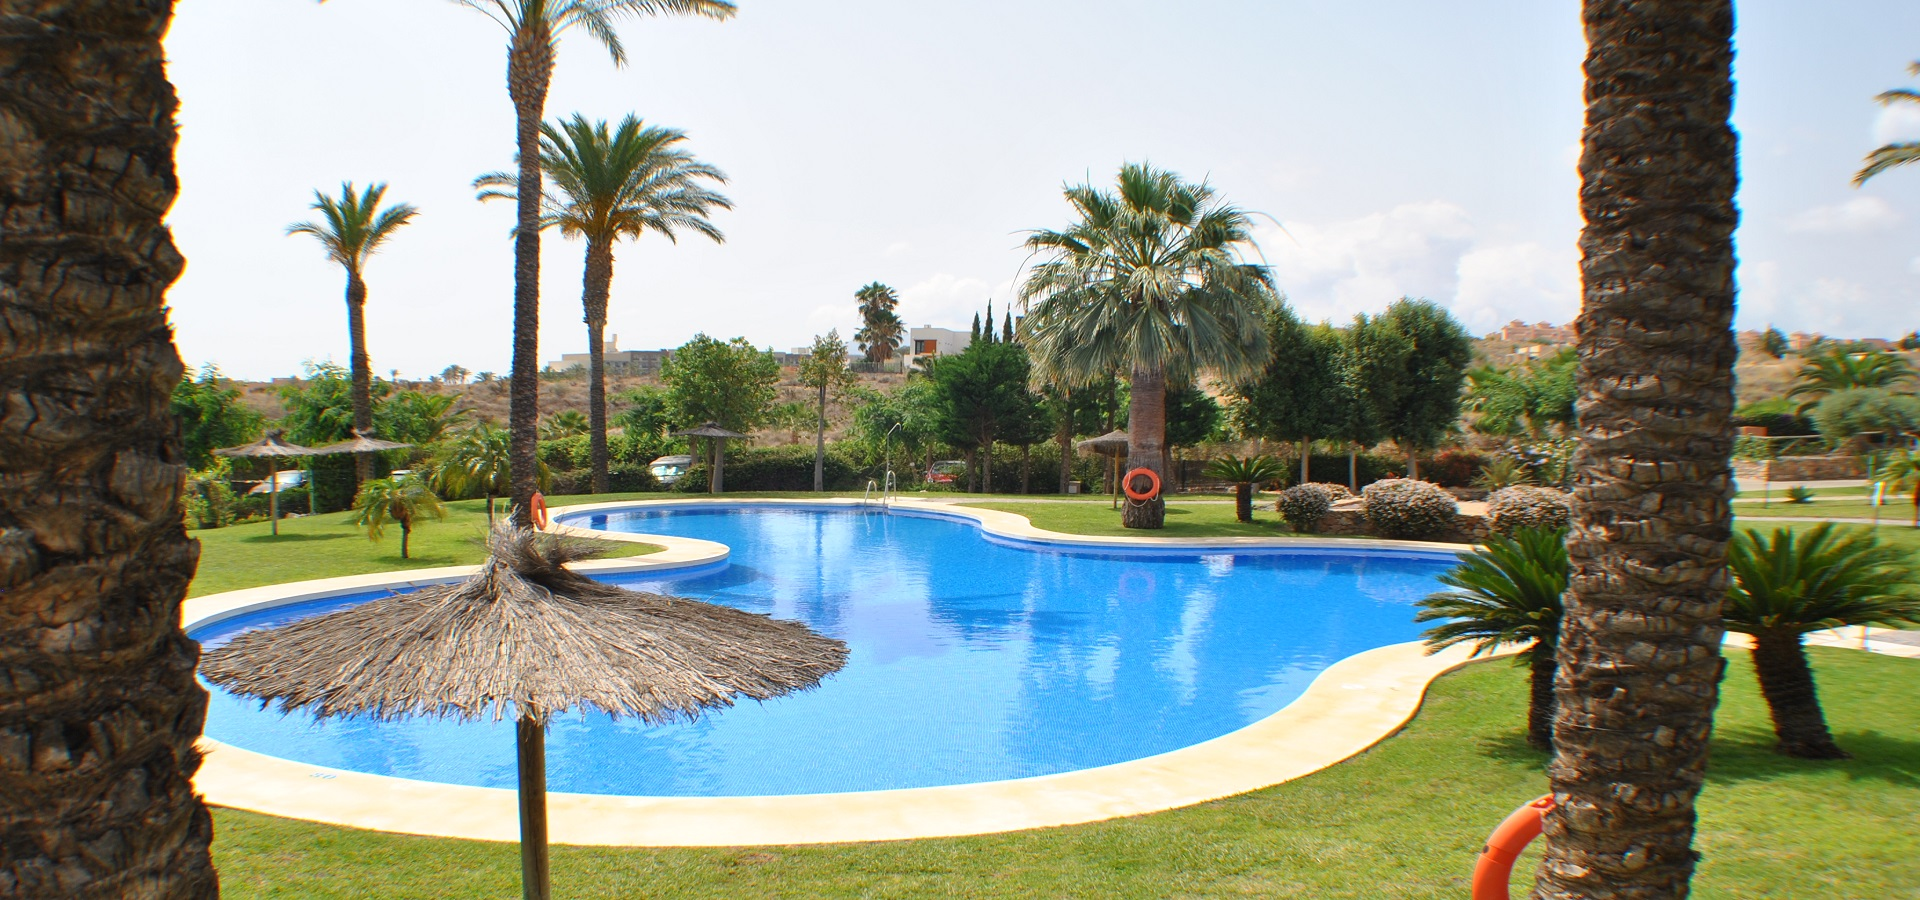 Piscina Villa D Alm.3 Bedroom Apartment For Sale Valle Del Este Premium